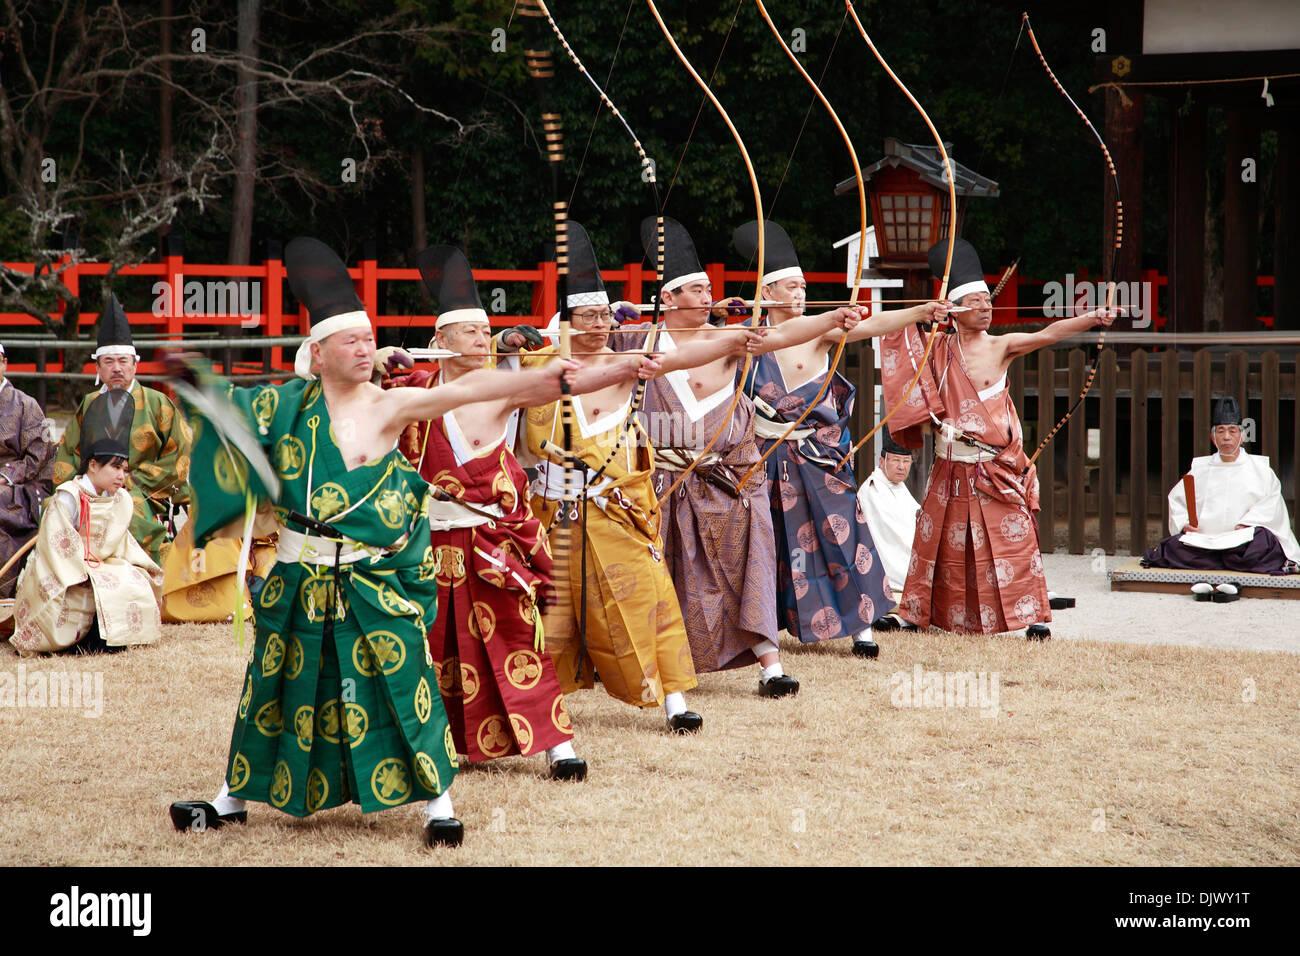 Japan, Kansai, Kyoto, Musha Shinji archery ceremony - Stock Image